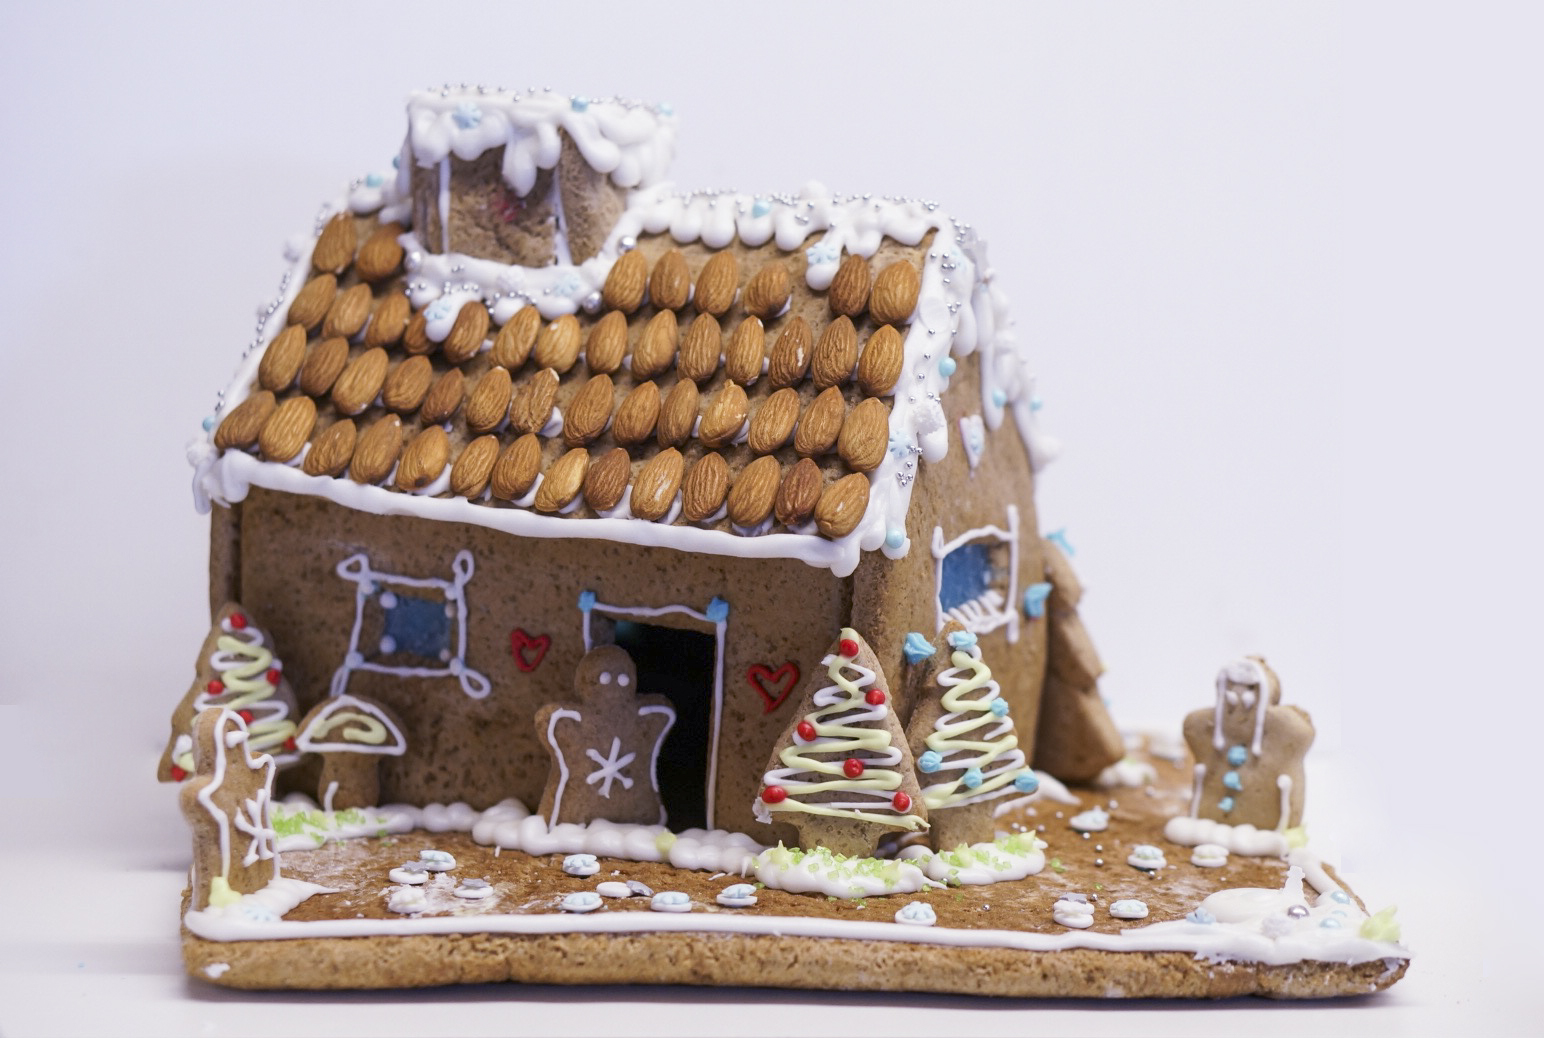 lebkuchenhaus rezept lebkuchenhaus selber machen makeurcake. Black Bedroom Furniture Sets. Home Design Ideas